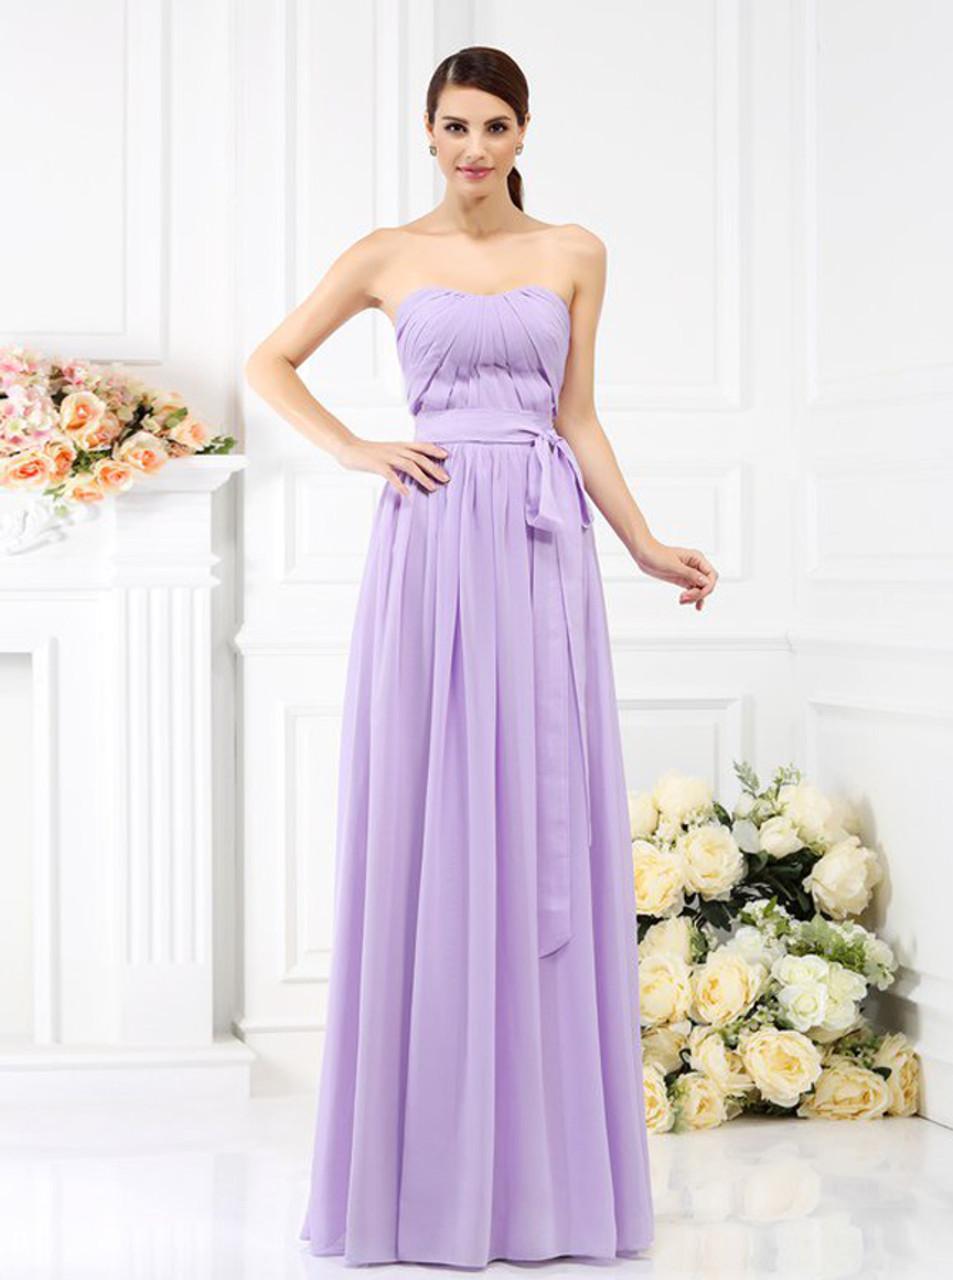 Lilac Strapless Dress